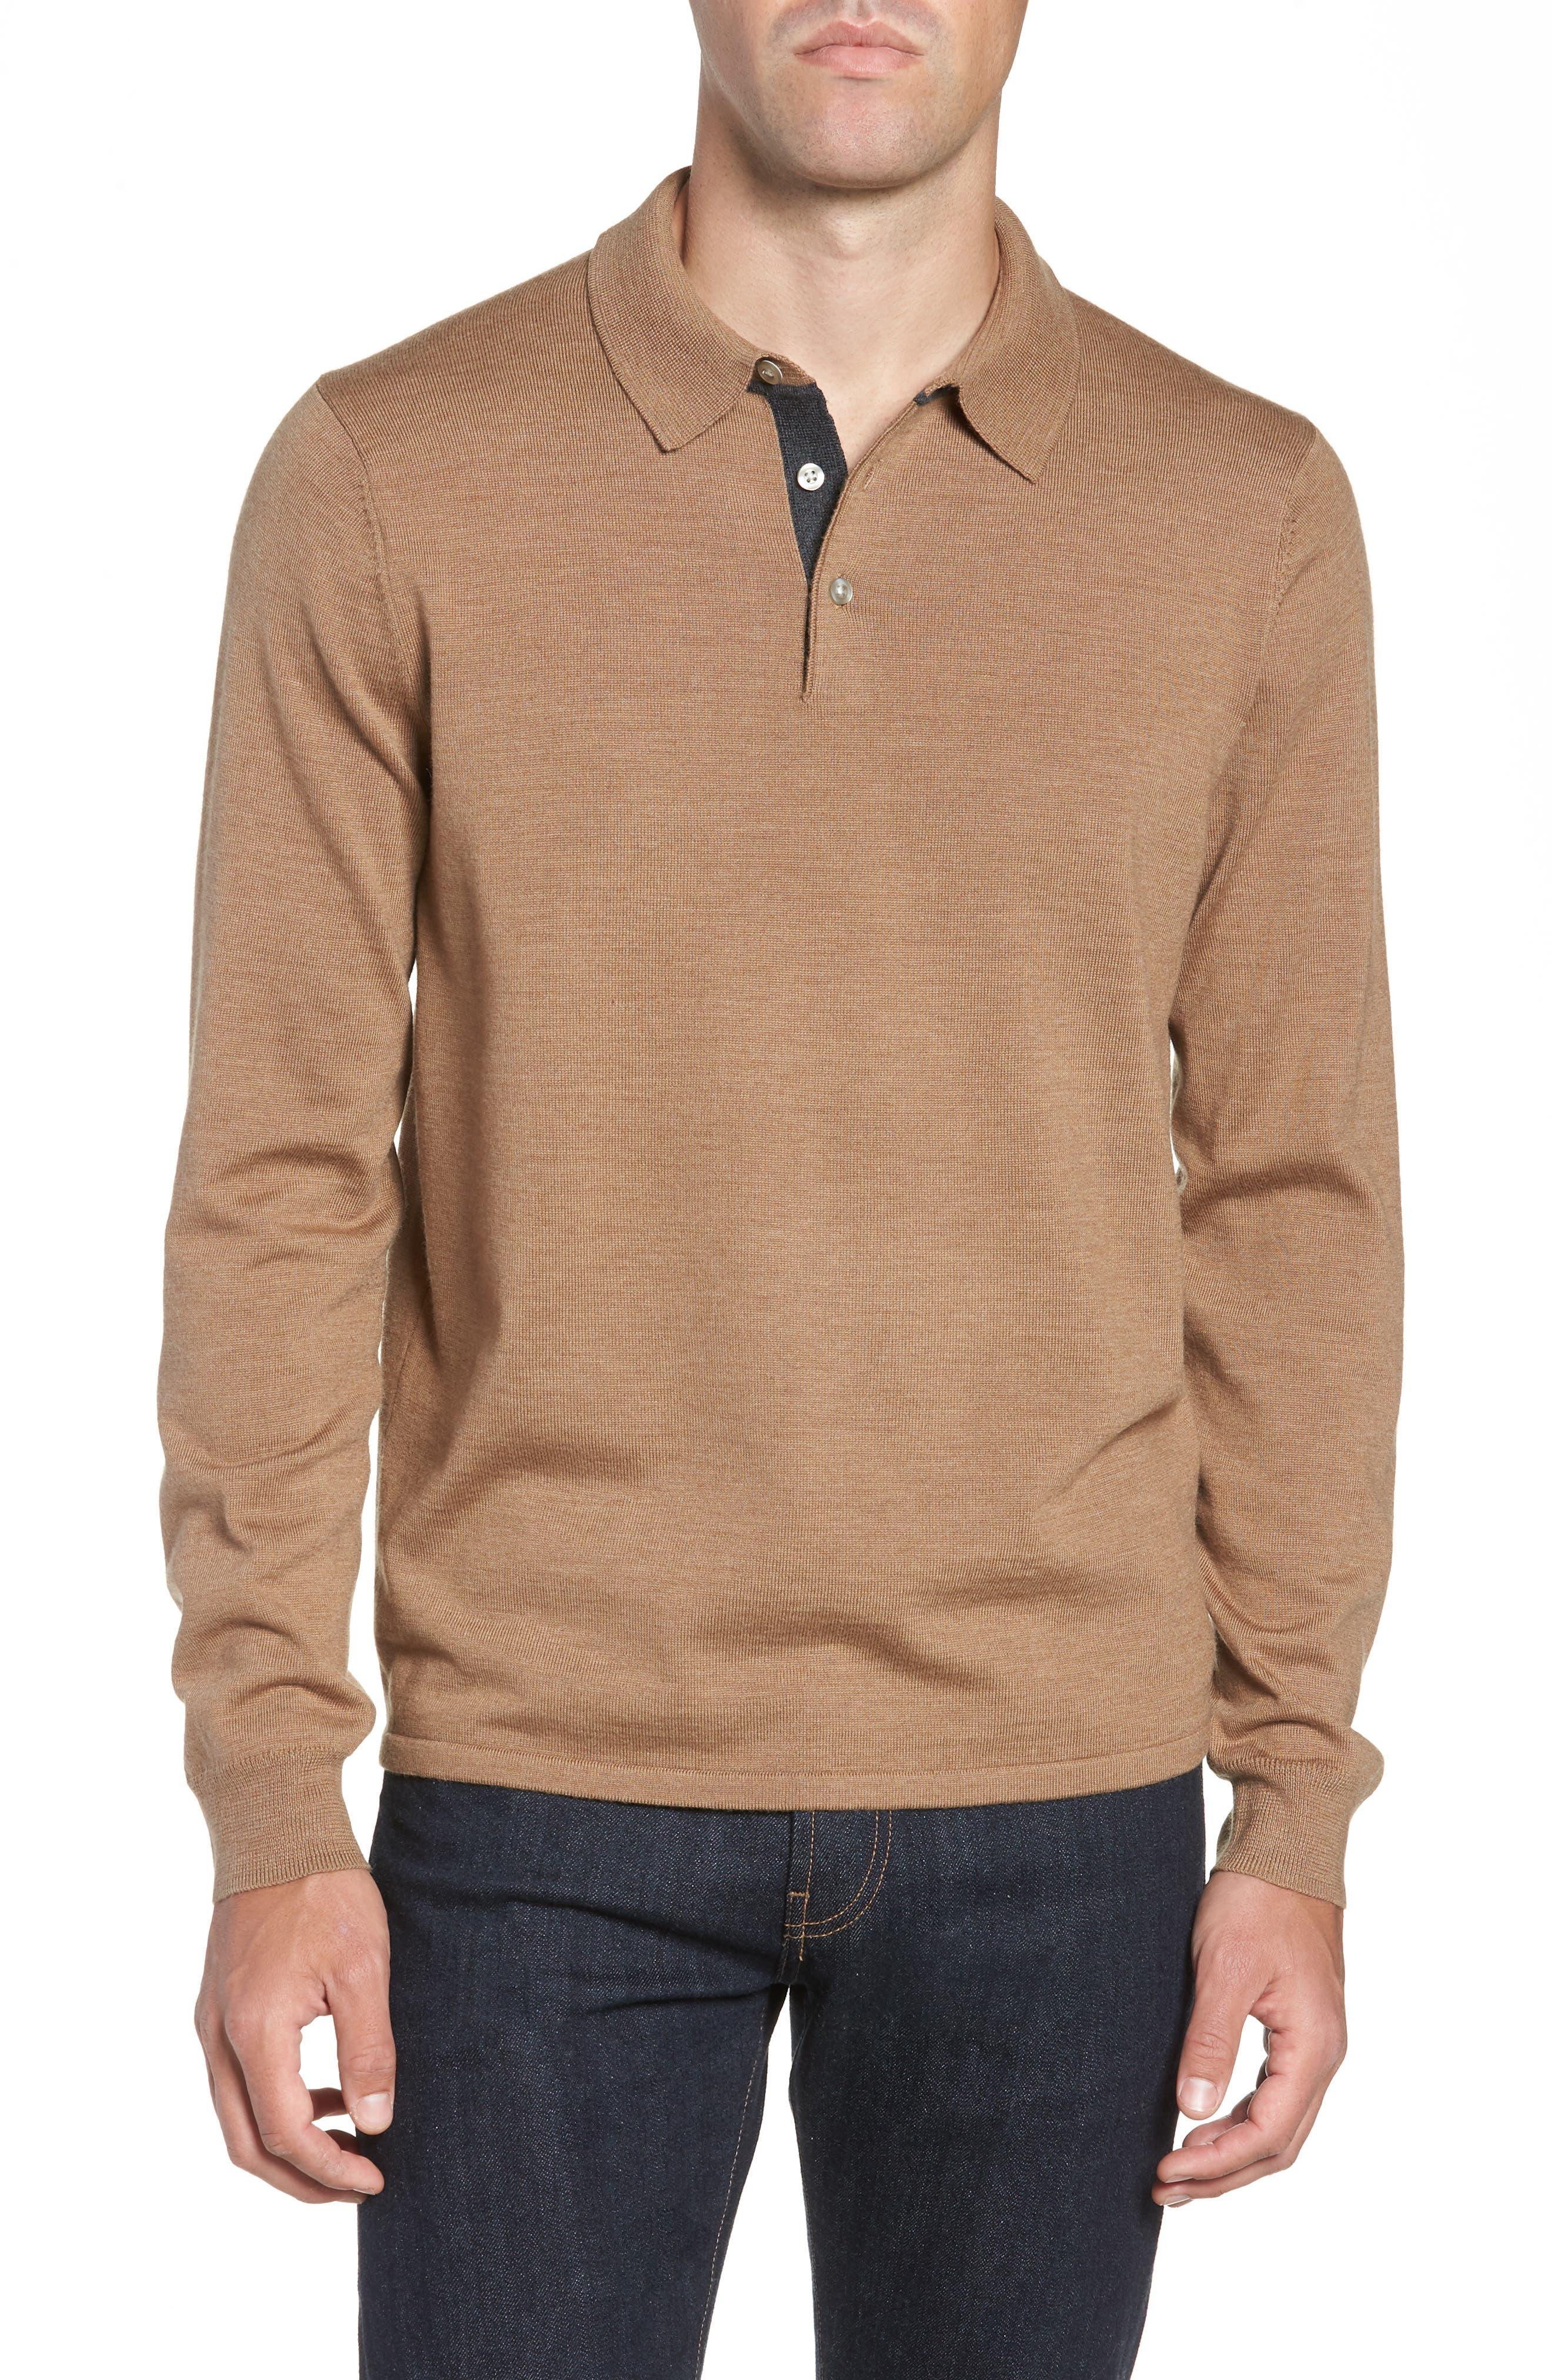 NORDSTROM MEN'S SHOP,                             Merino Wool Polo Sweater,                             Main thumbnail 1, color,                             211